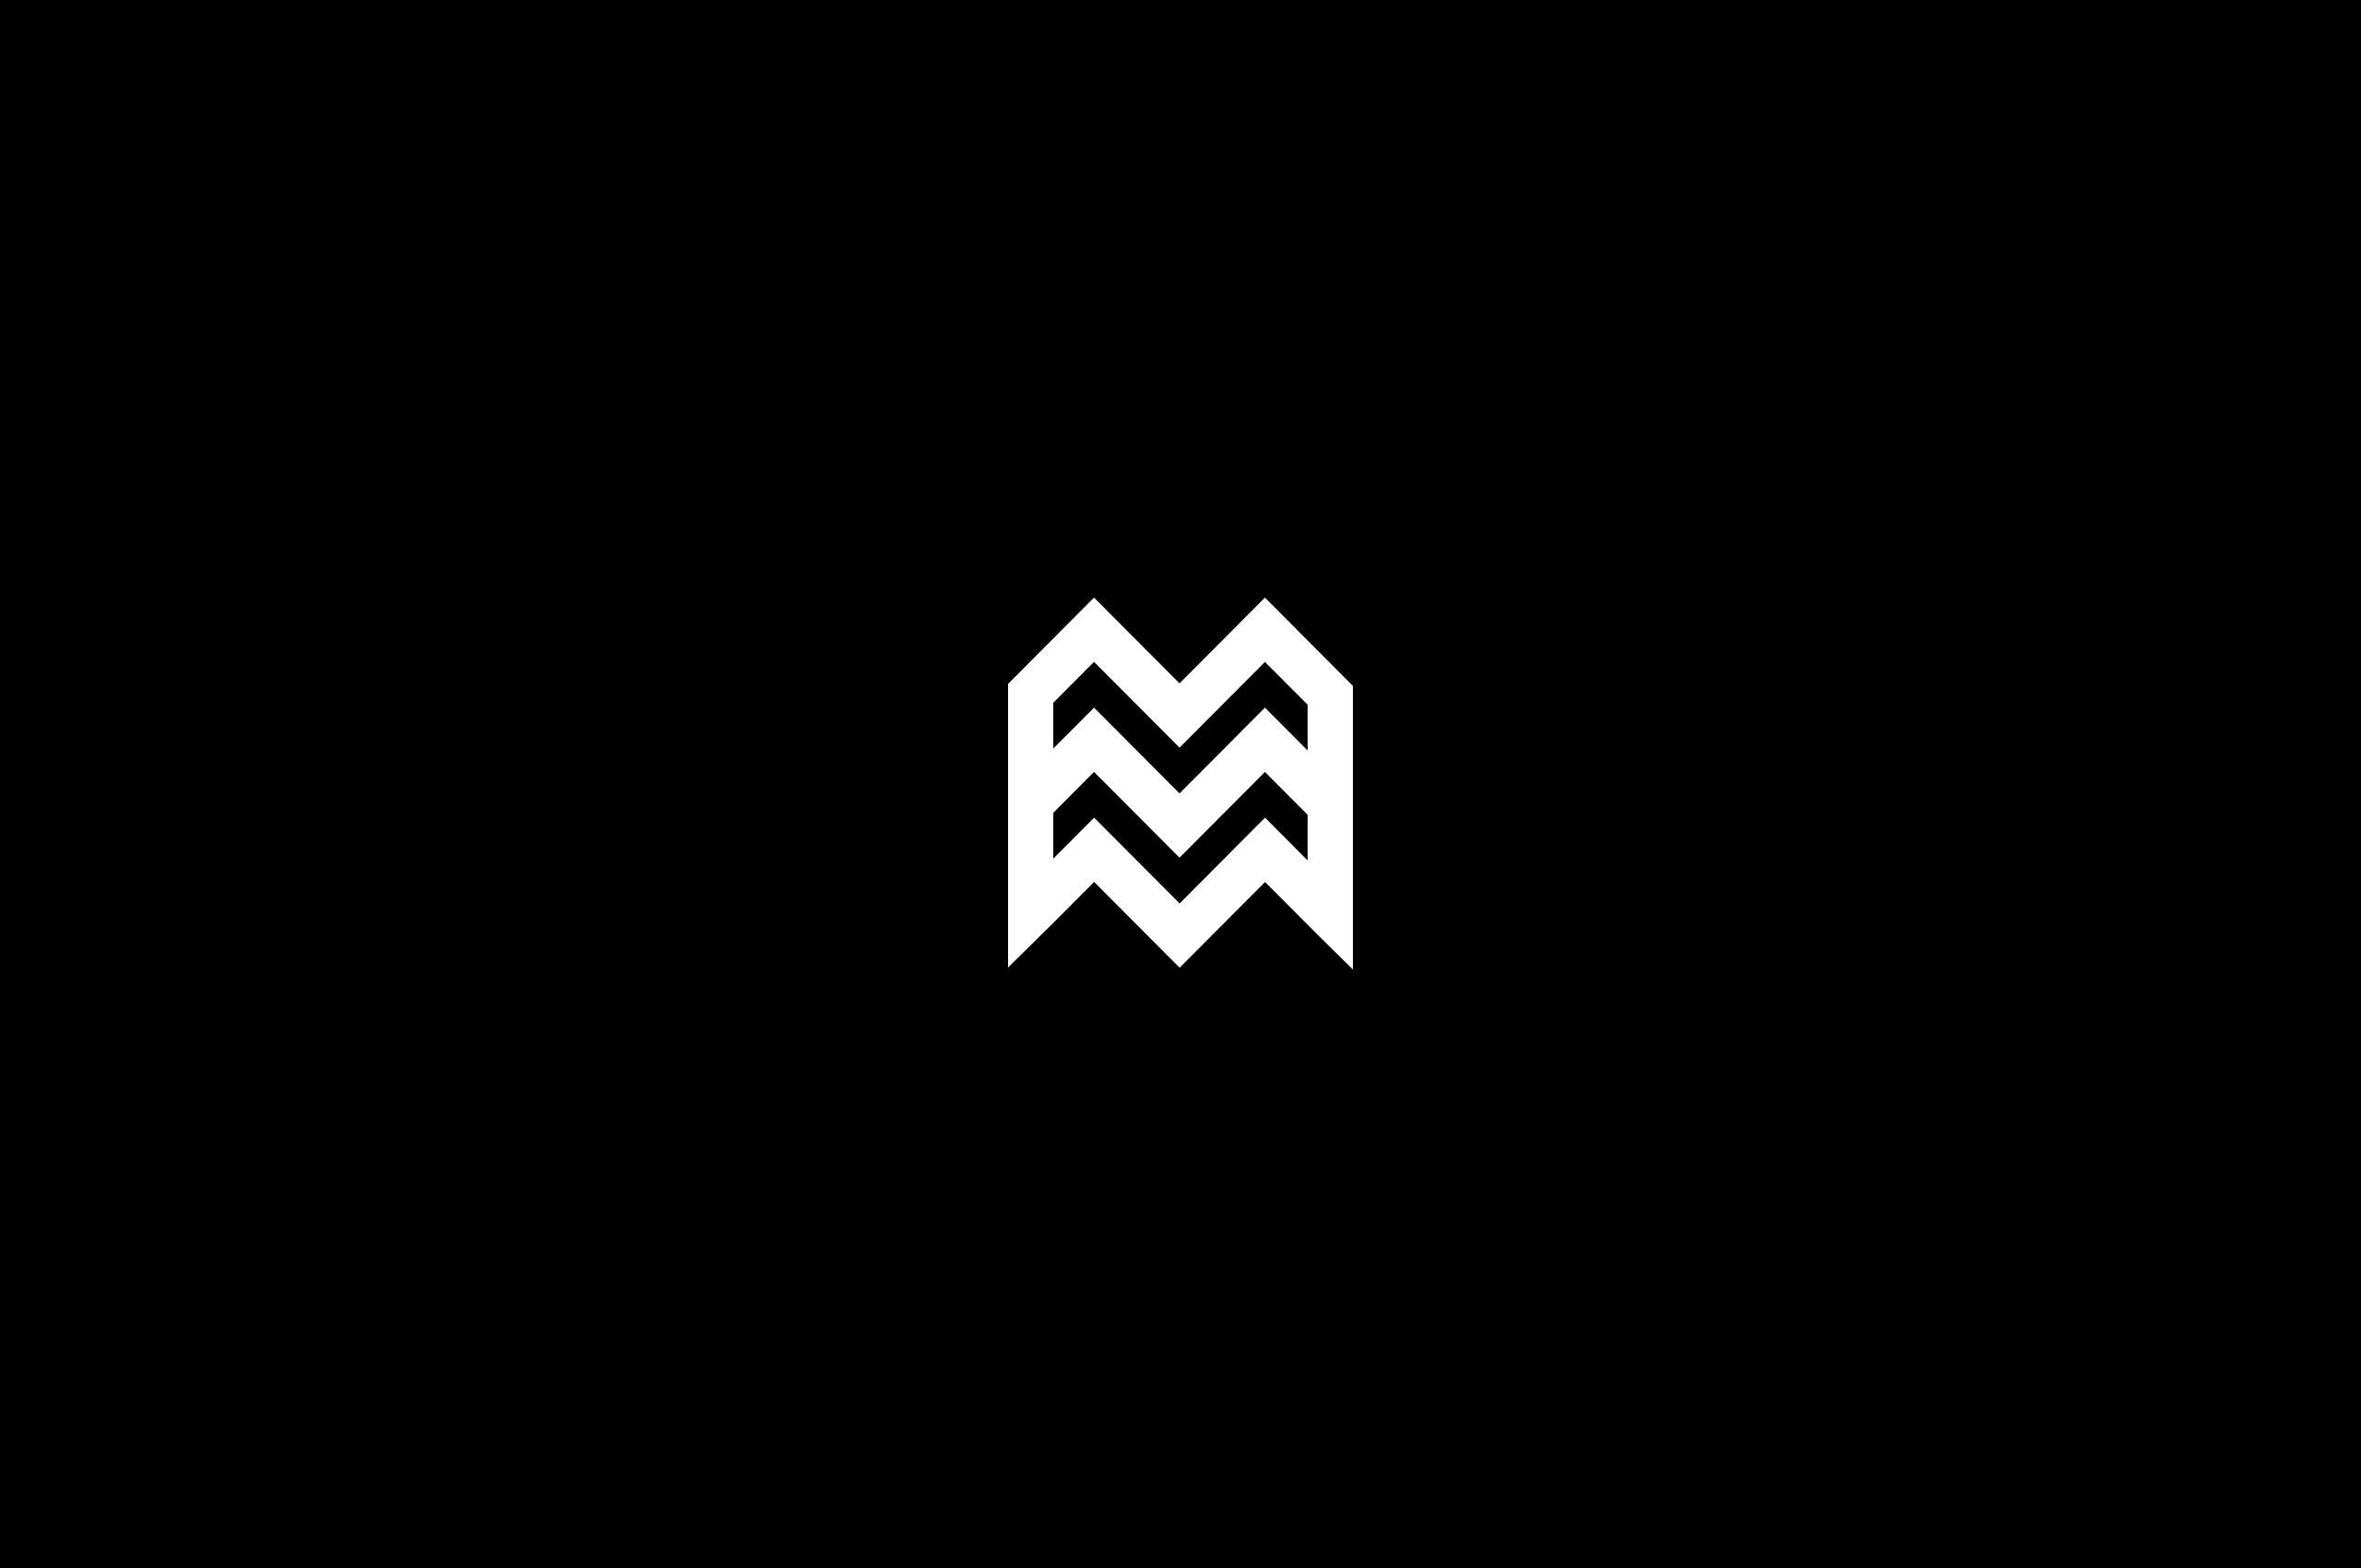 logo-2-black